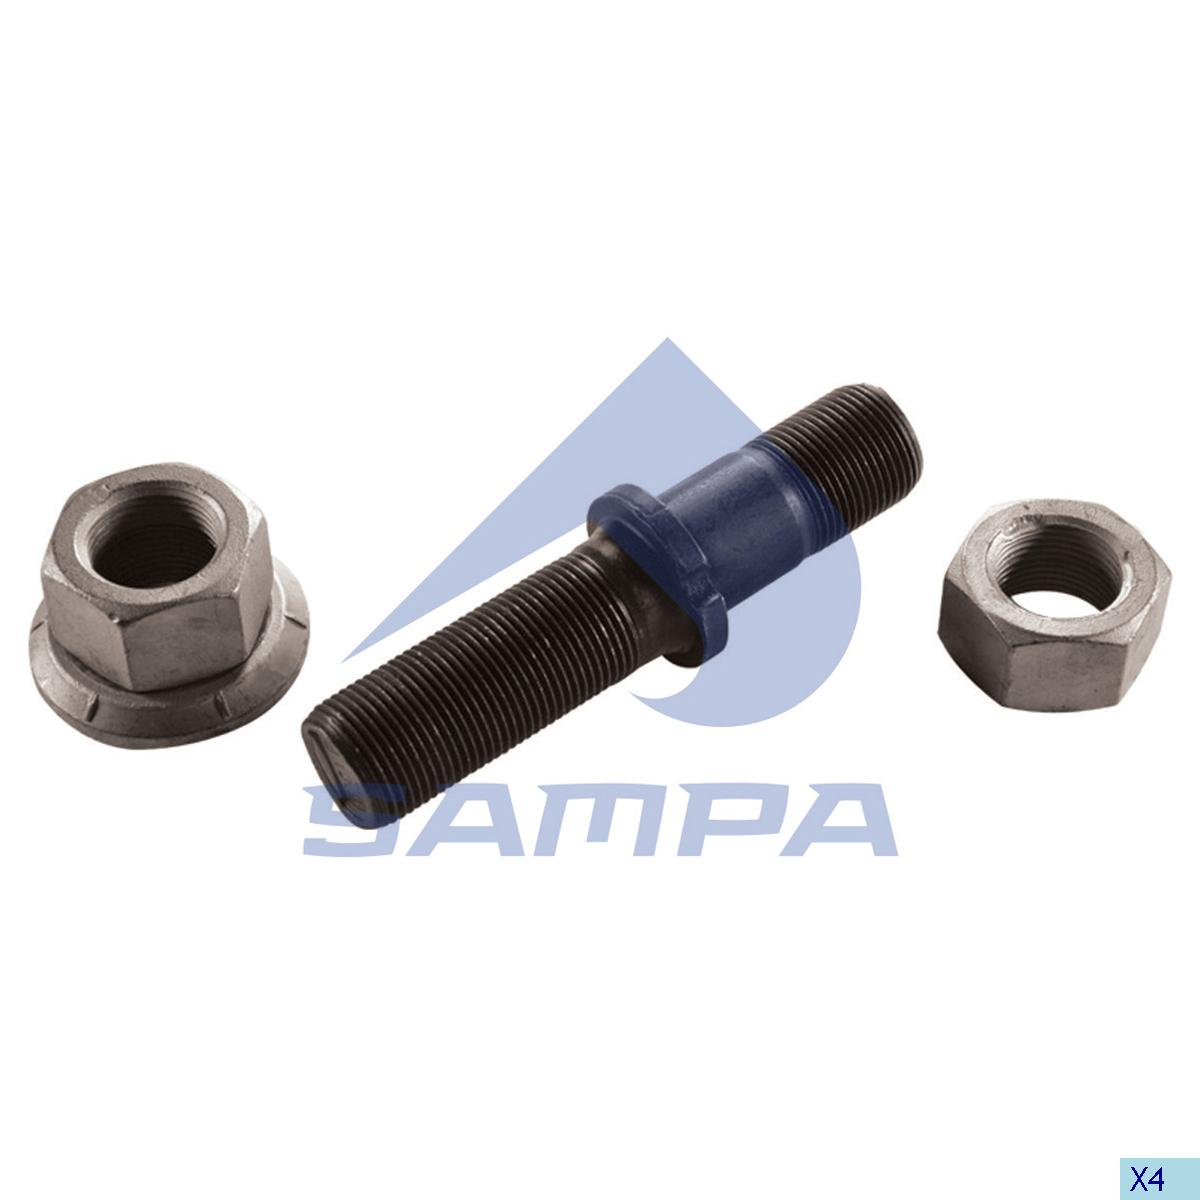 Repair Kit, Stud, Sauer Achsen, Power Unit